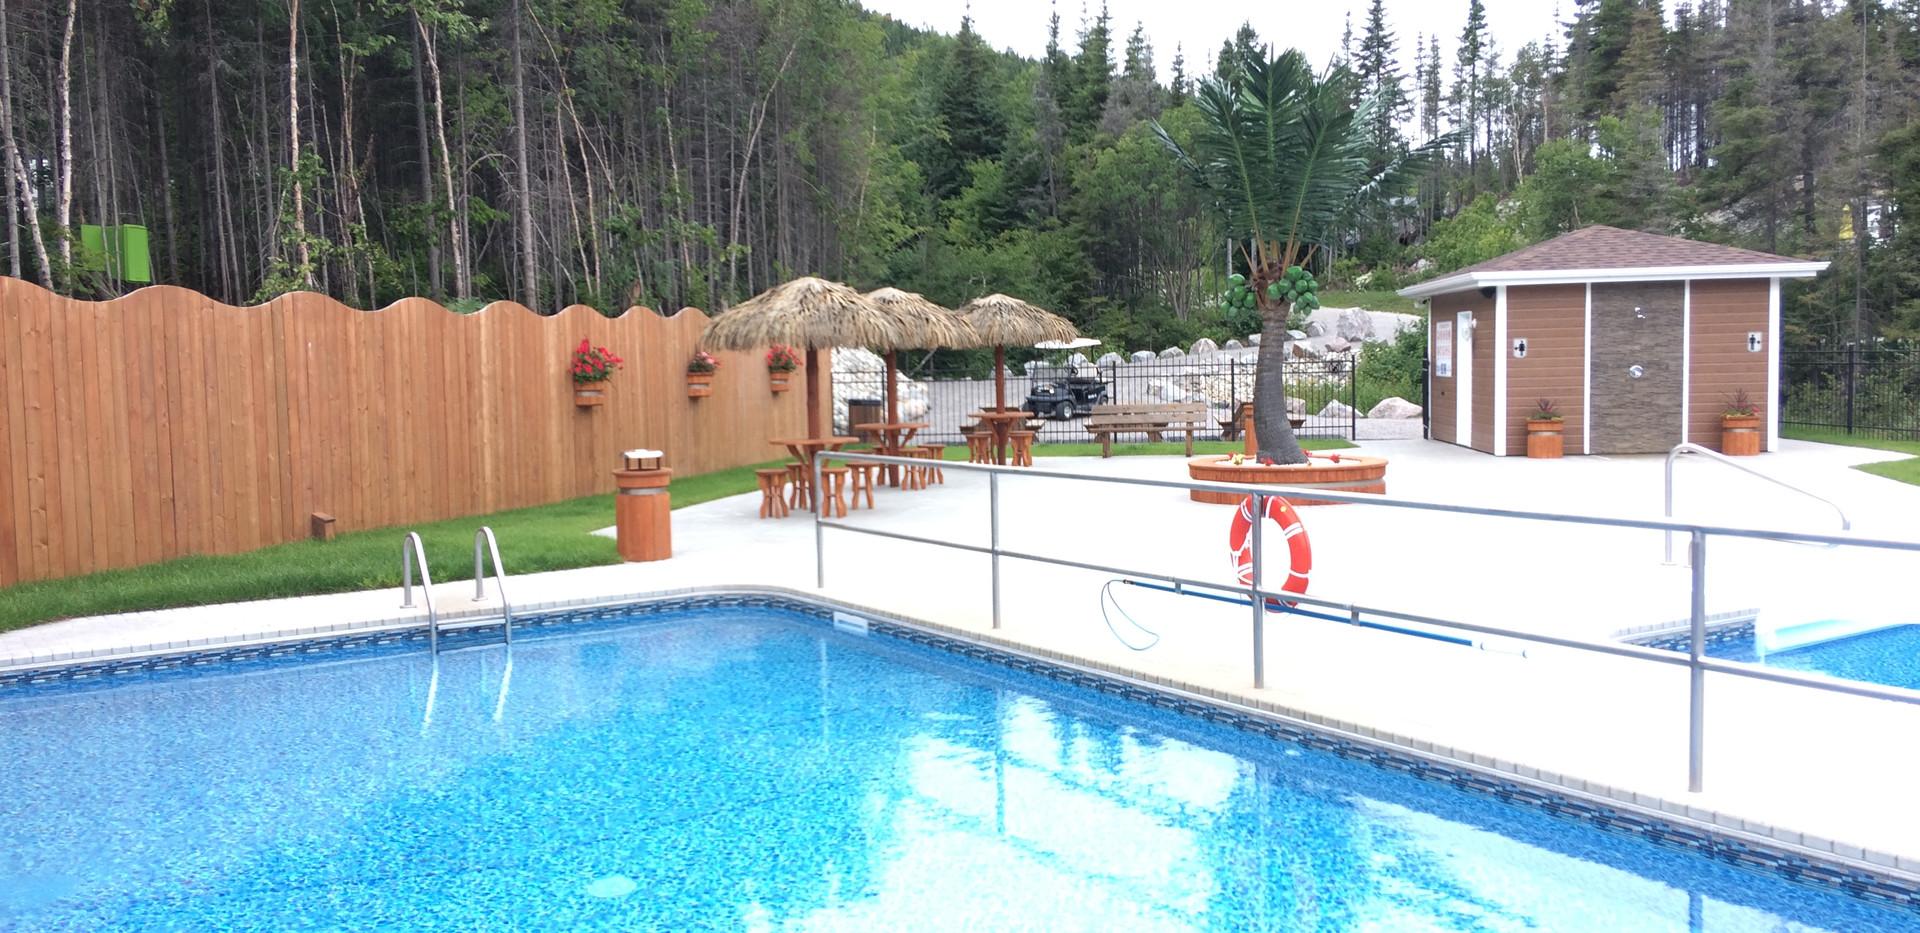 piscine-glissade-eau-camping-boreal-9.JP